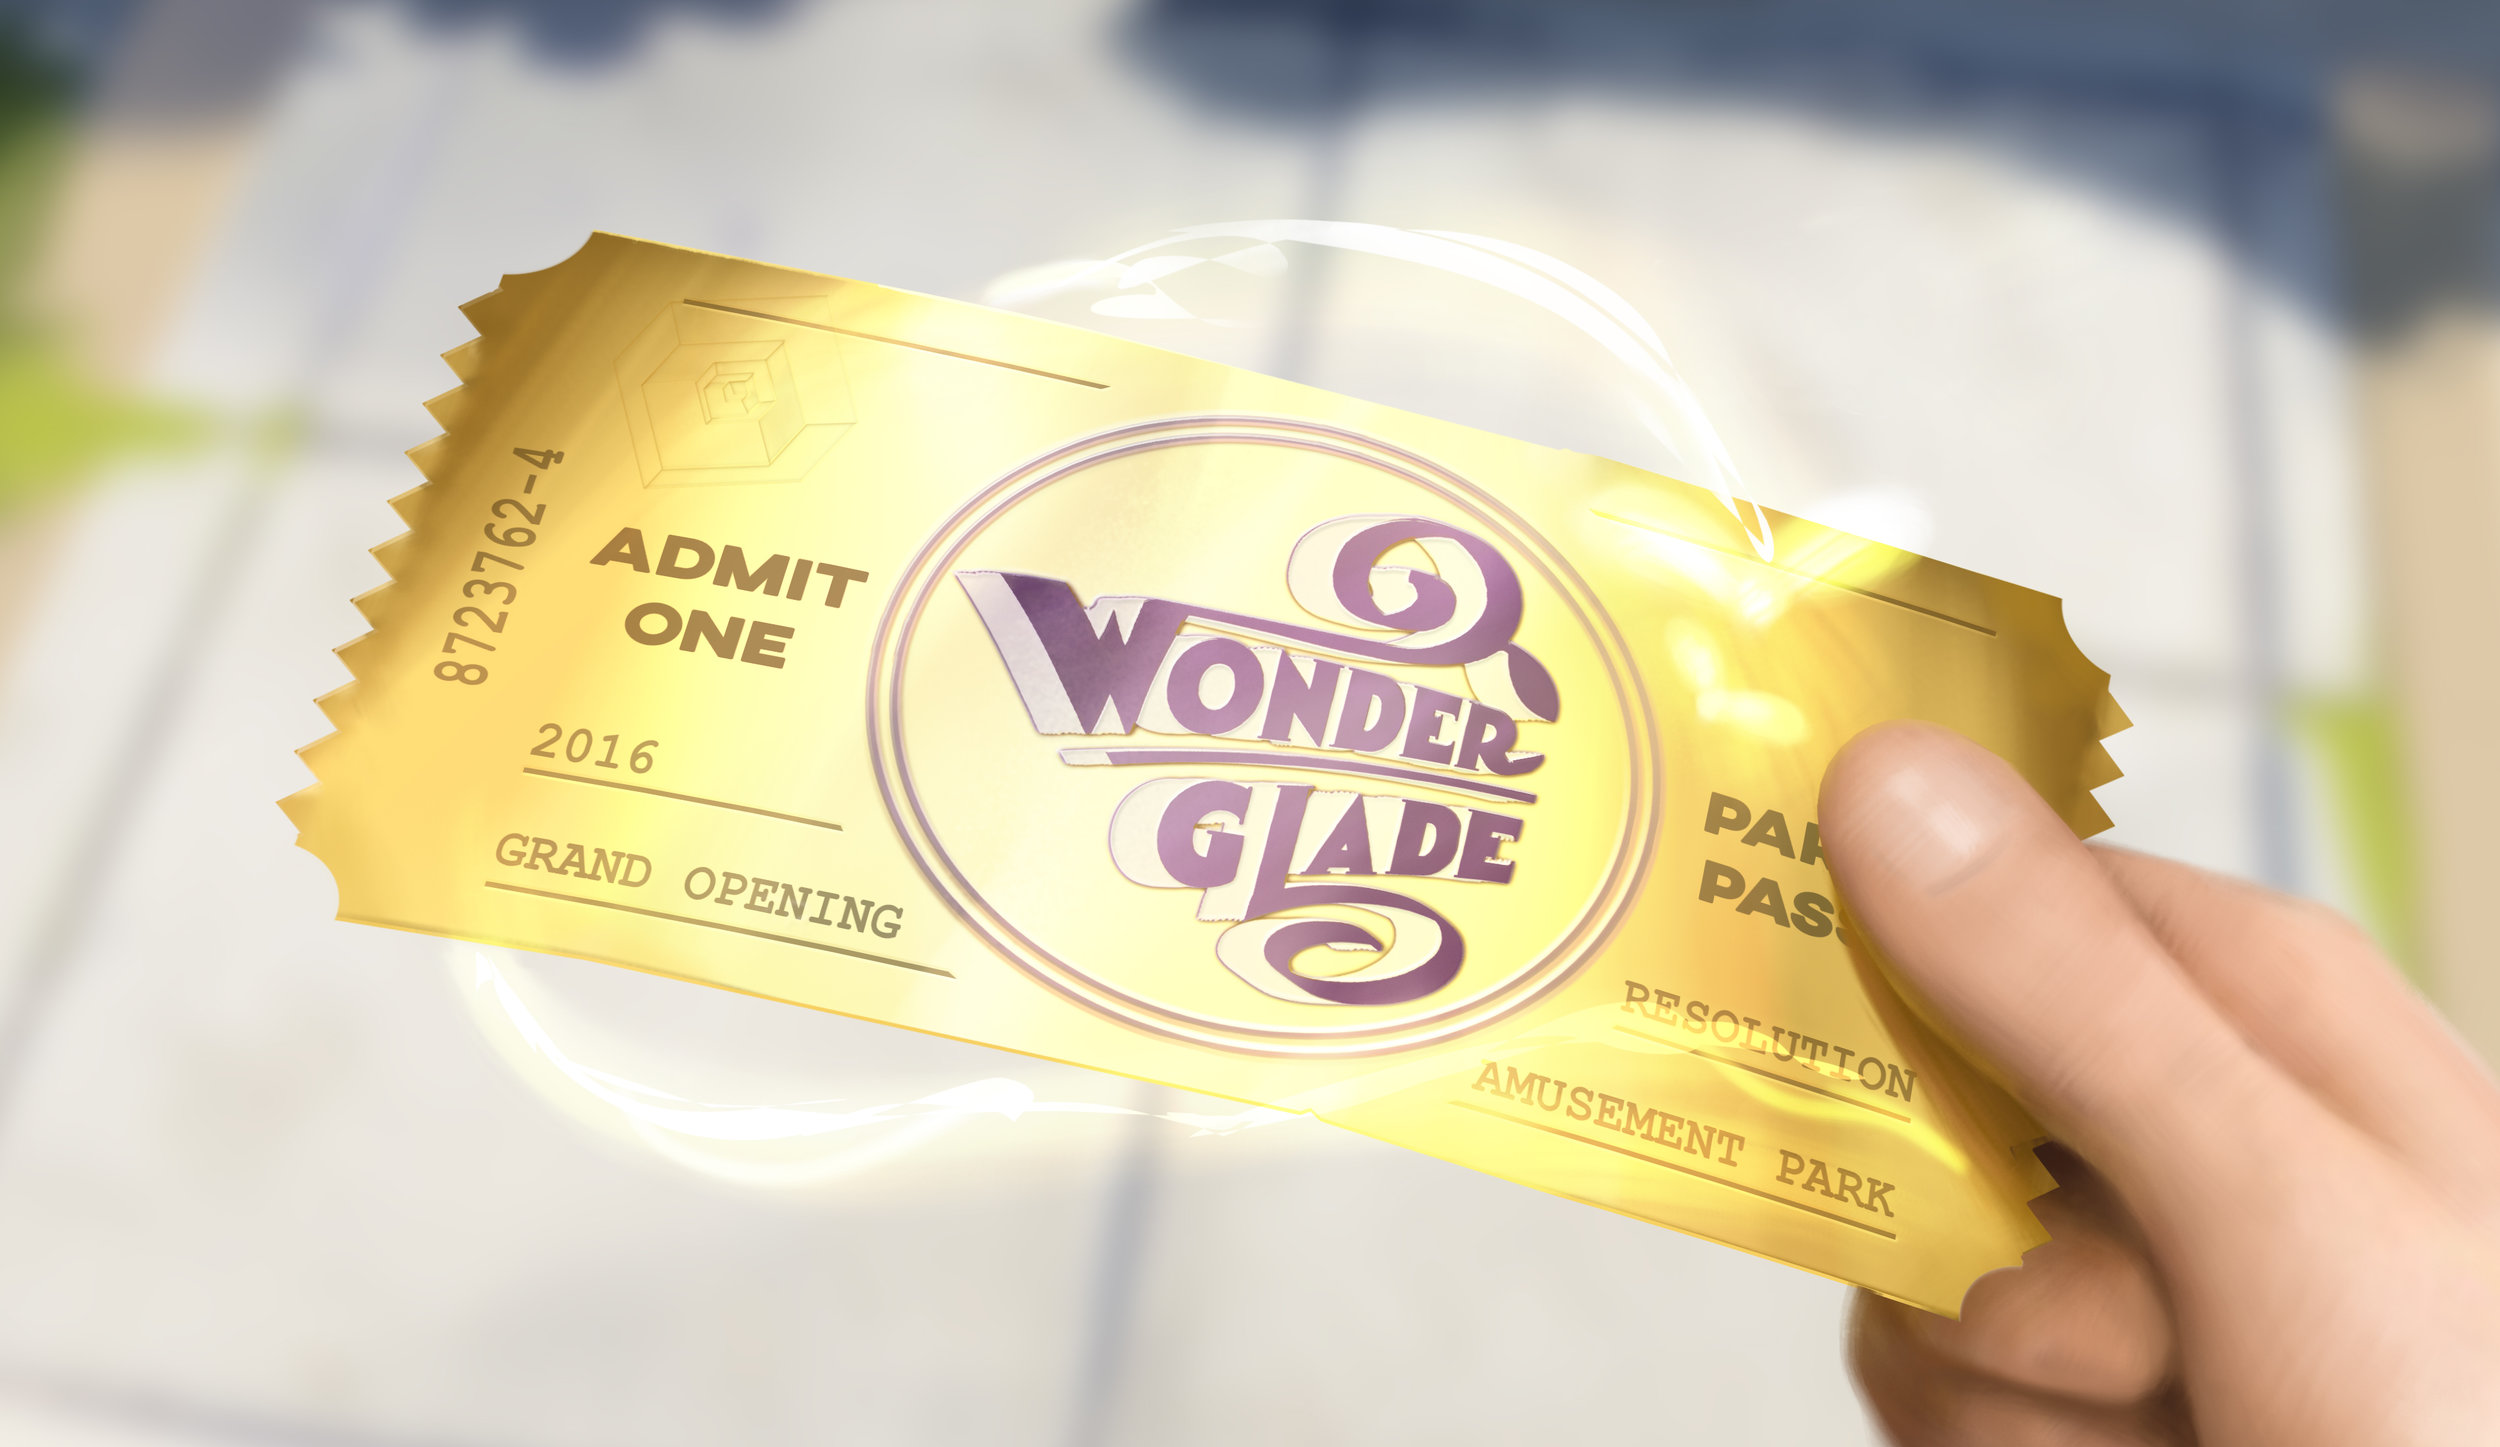 WondergladeTicket (1).jpg